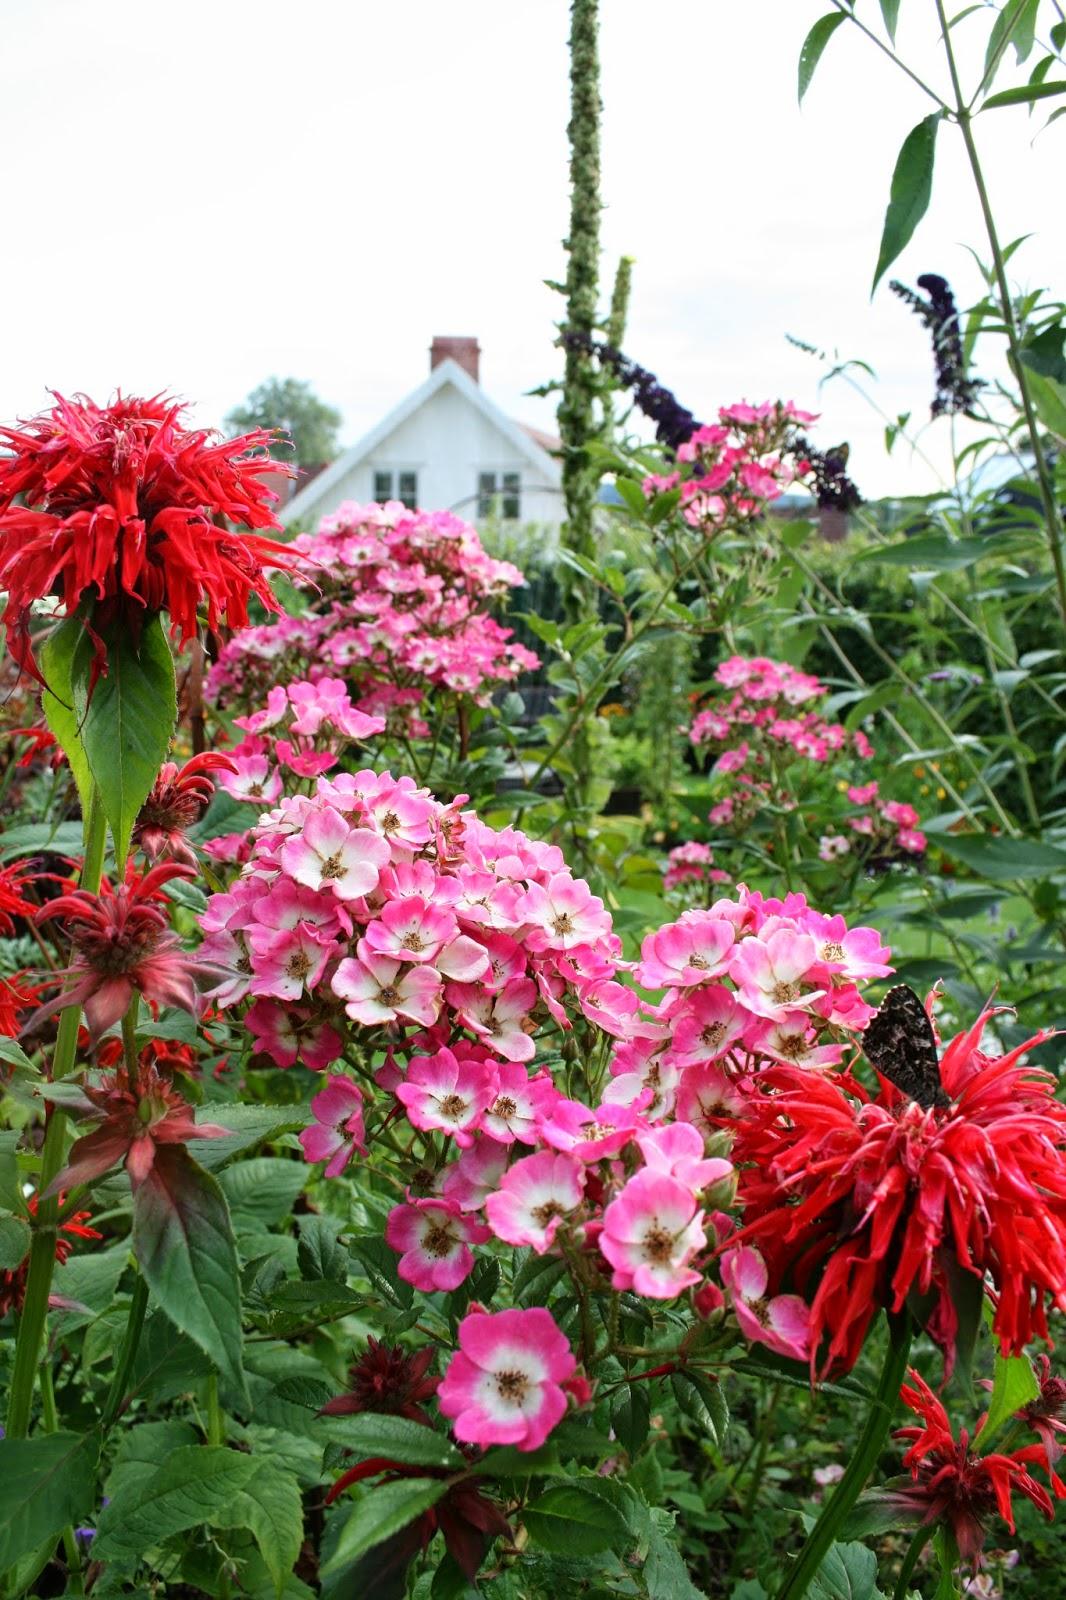 temynta monarda gardenview scarlet